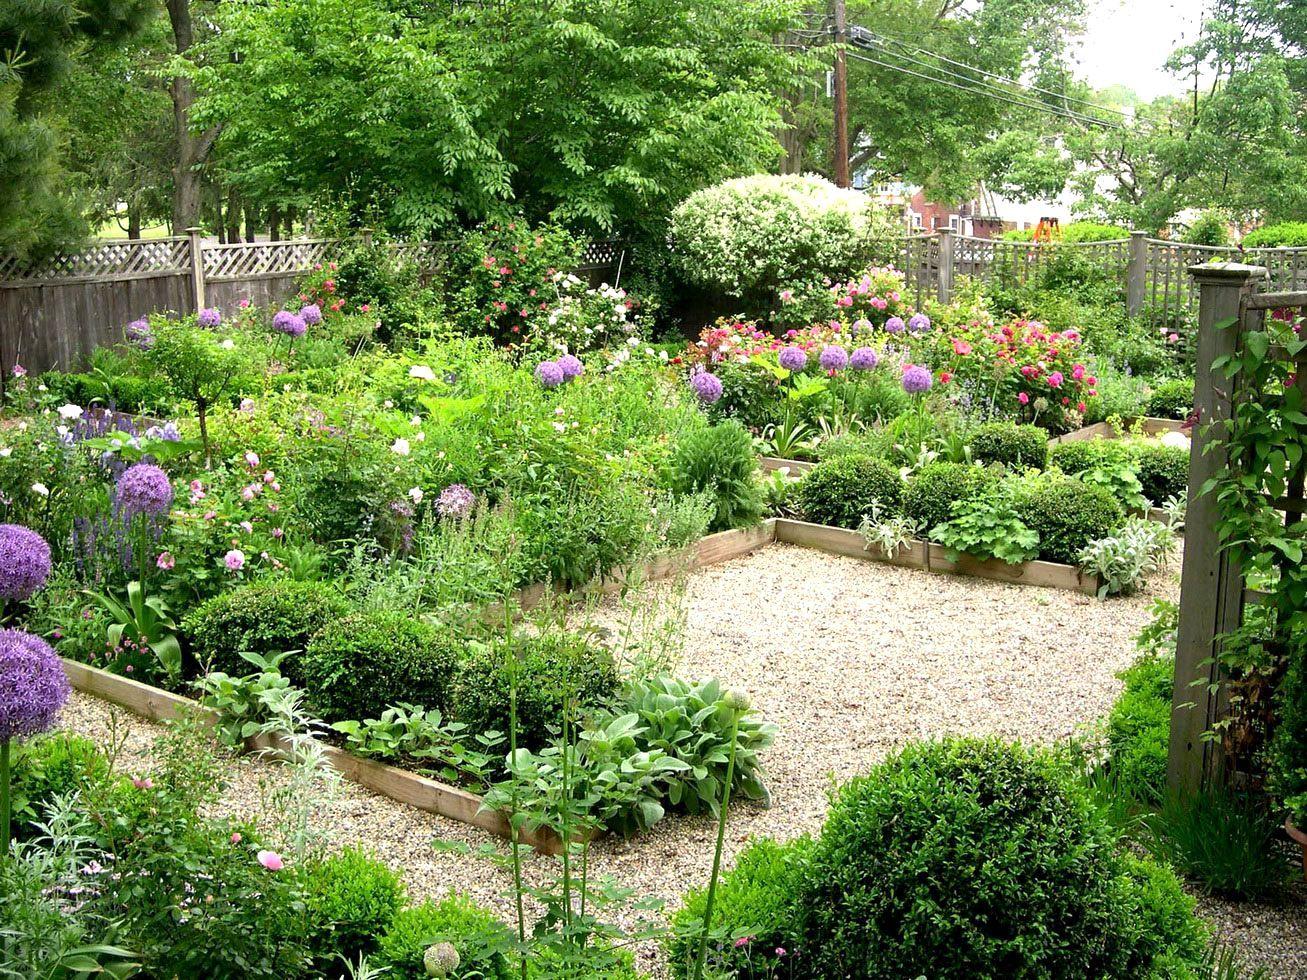 Garden Design Nz Ideas low maintenance garden designs nz contemporary garden design ideas